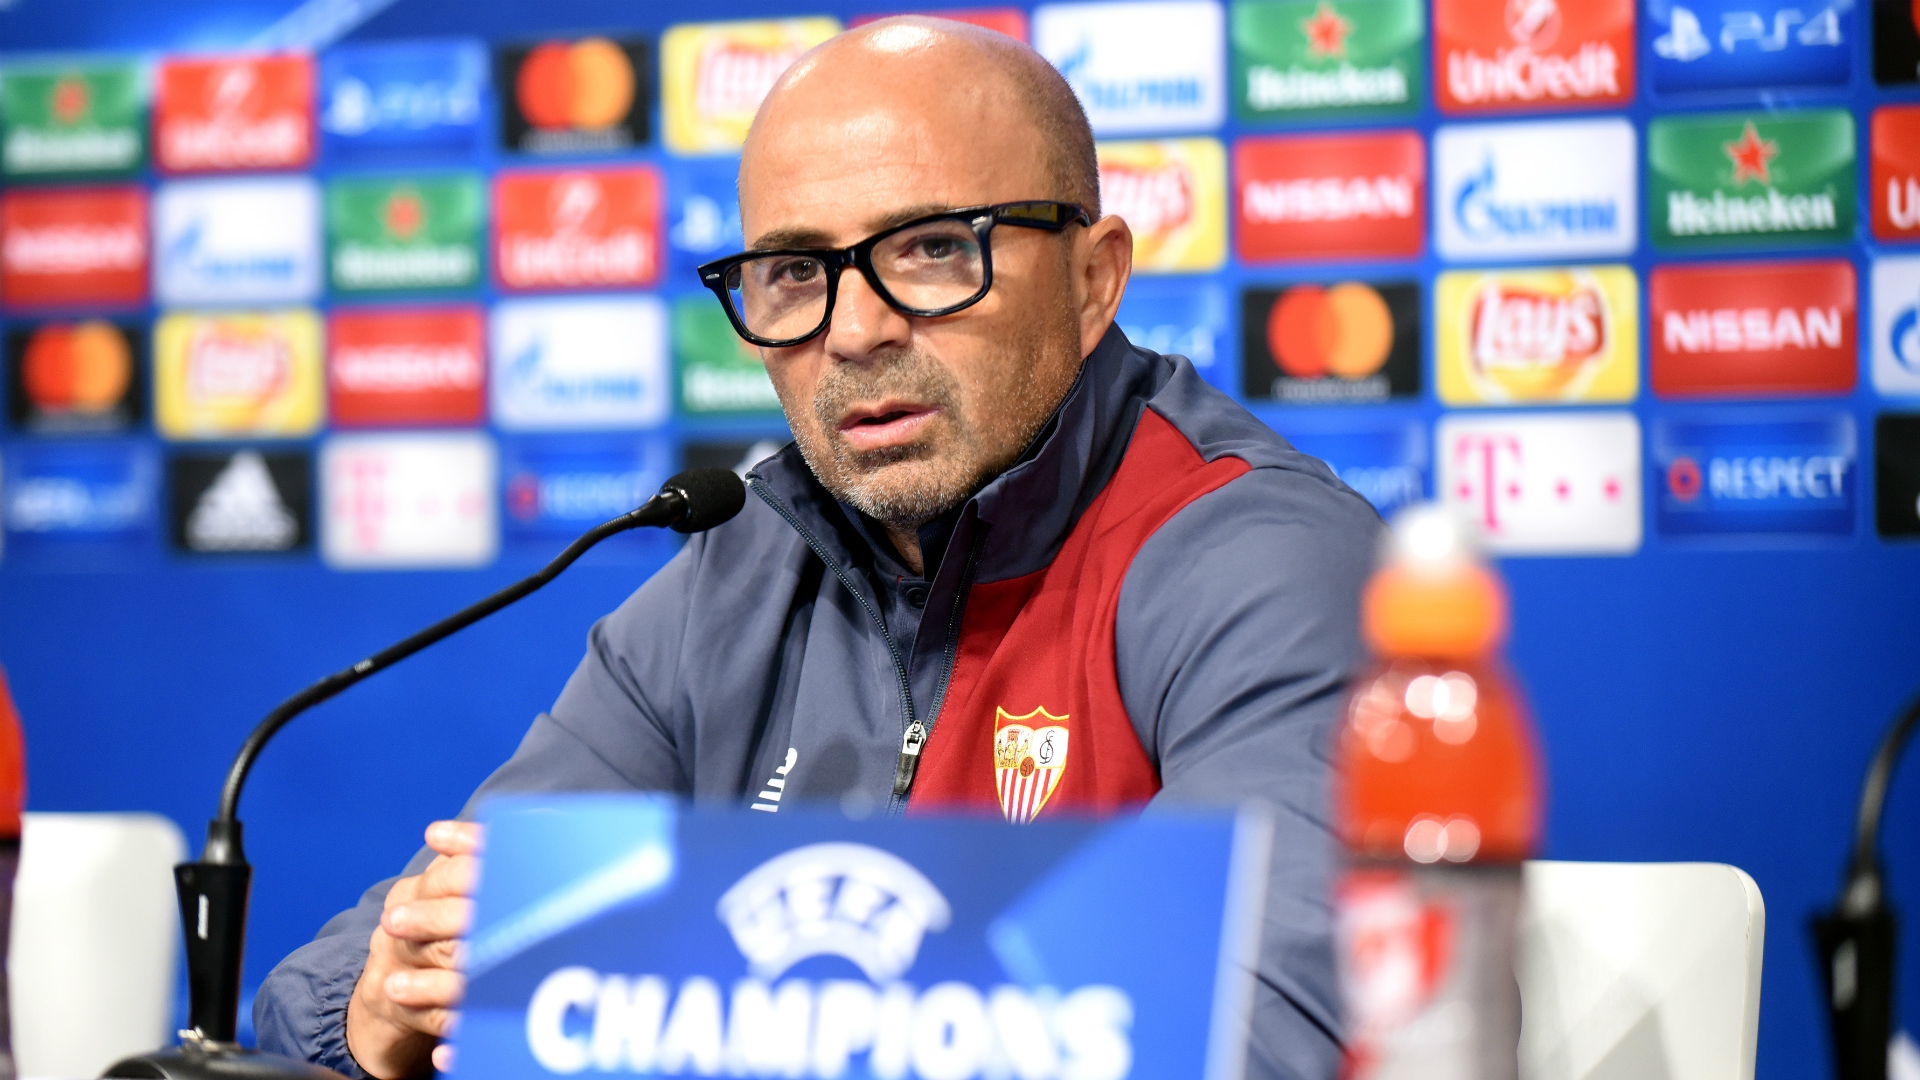 Sevilla showing its strength under coach Sampaoli